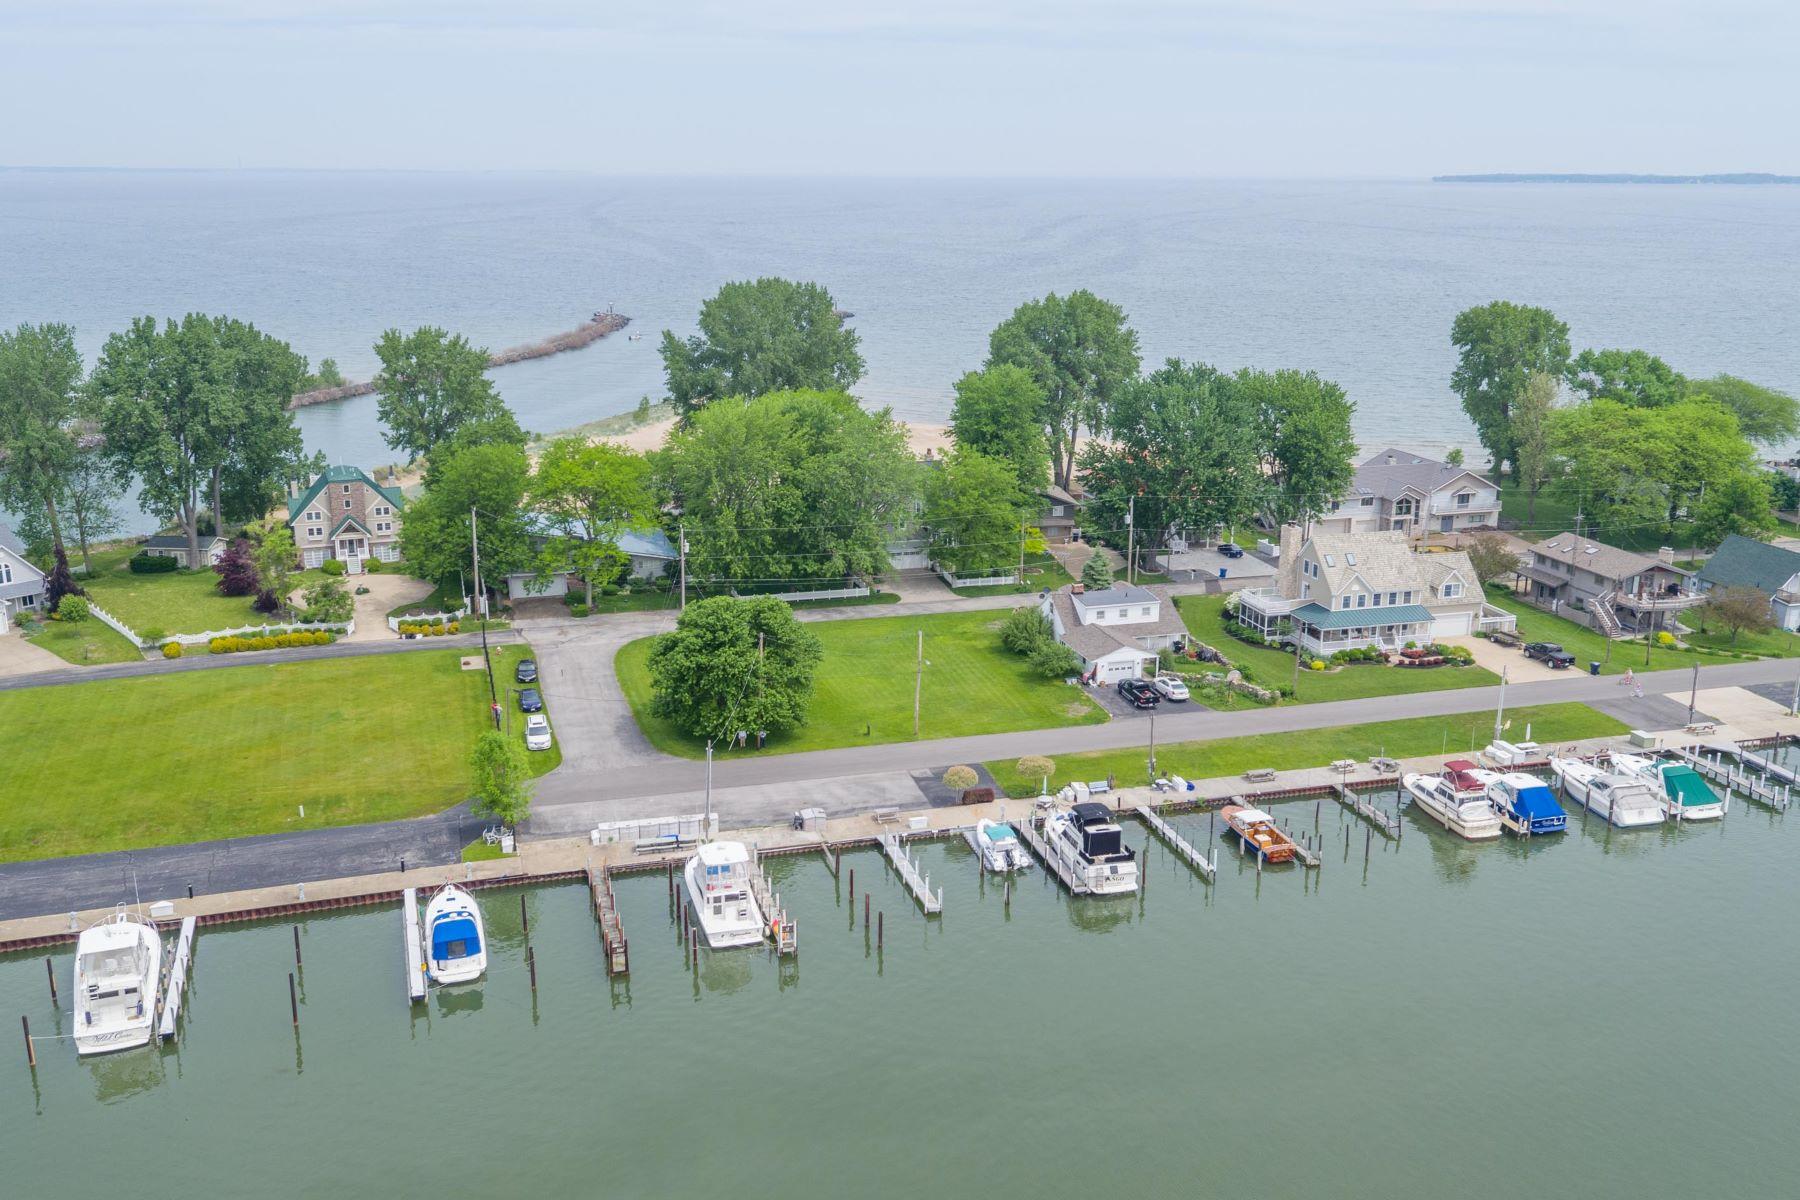 Land for Sale at Dock & Lot in Bar Harbor - 1 Lake Blvd., Marblehead, Ohio 43440 1 Lake Boulevard Marblehead, Ohio, 43440 United States